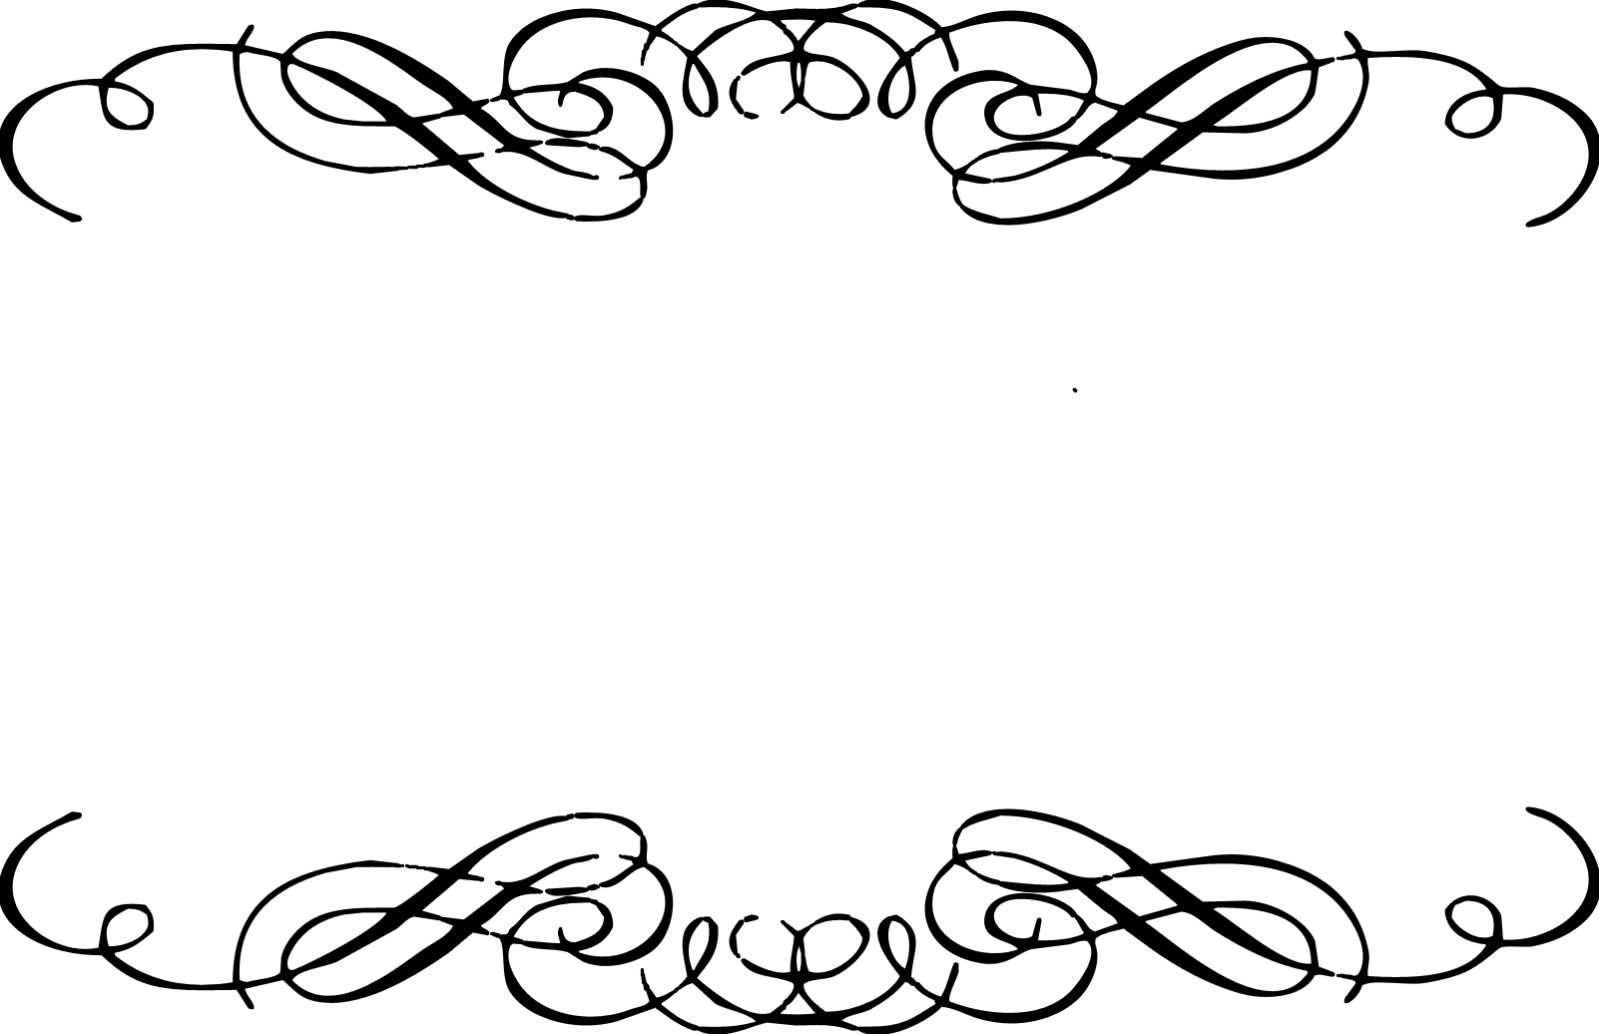 1599x1034 Scroll Border Clip Art